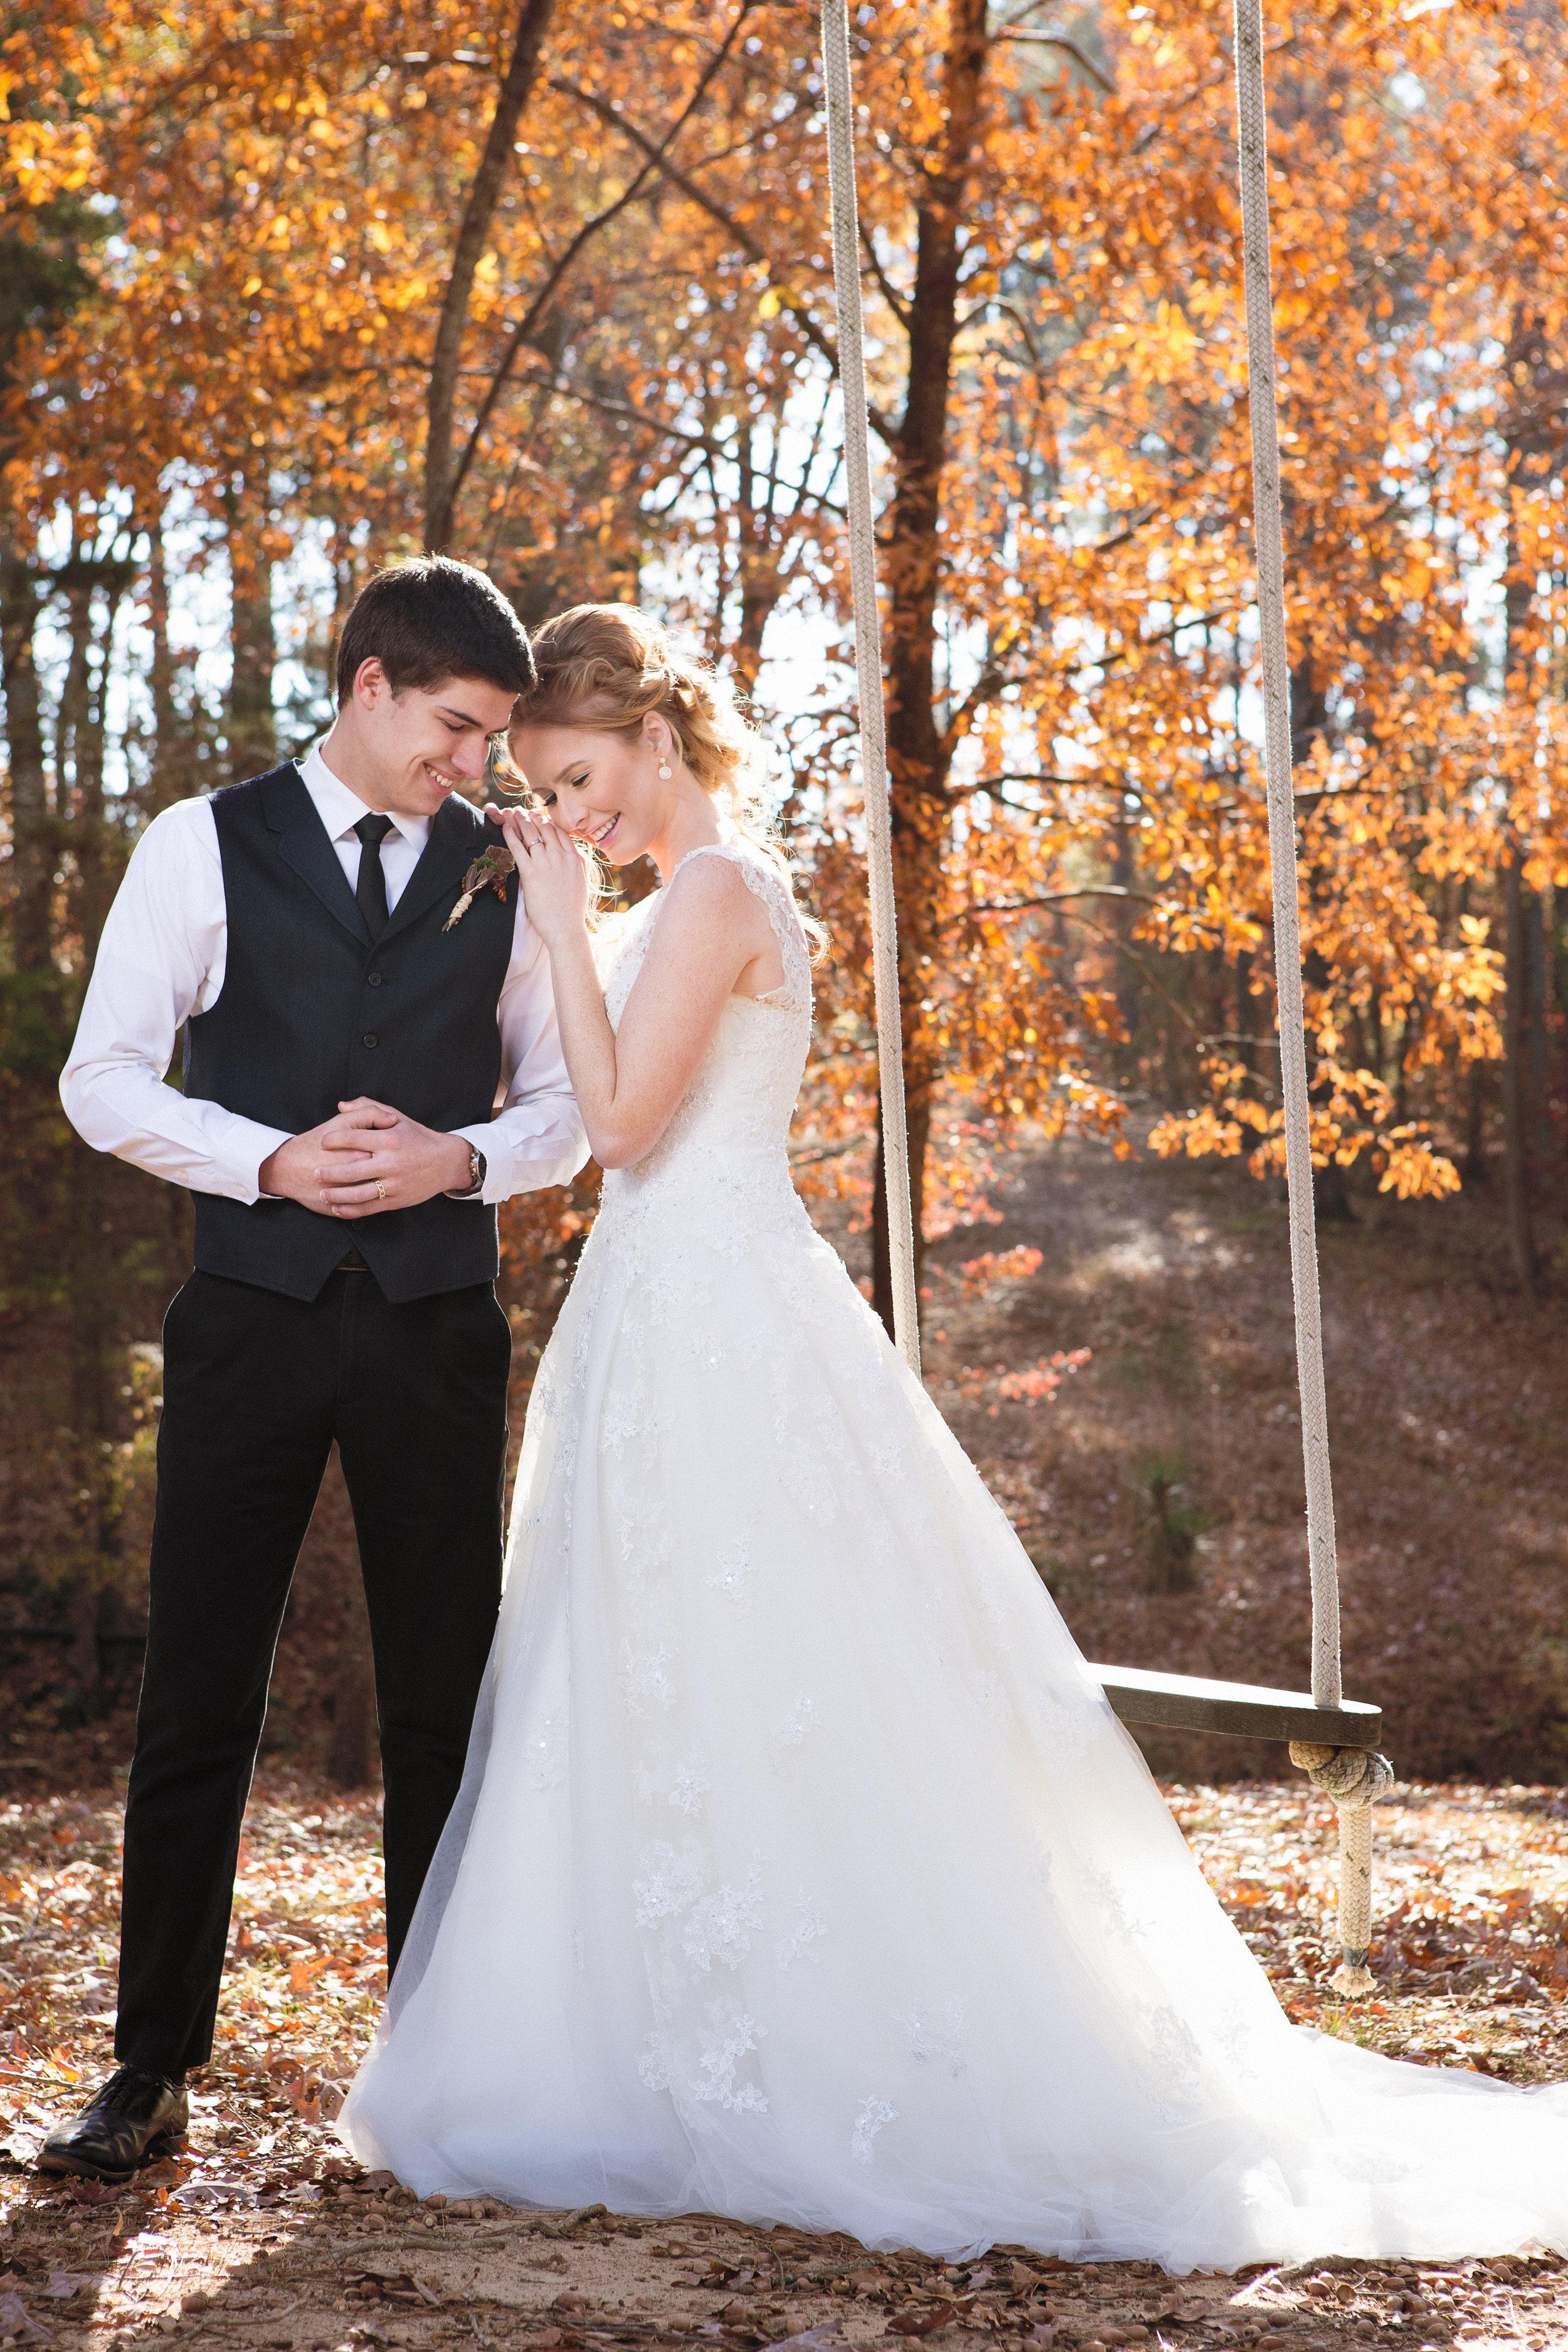 Pheauxtography_WeddingConcept-12.jpg